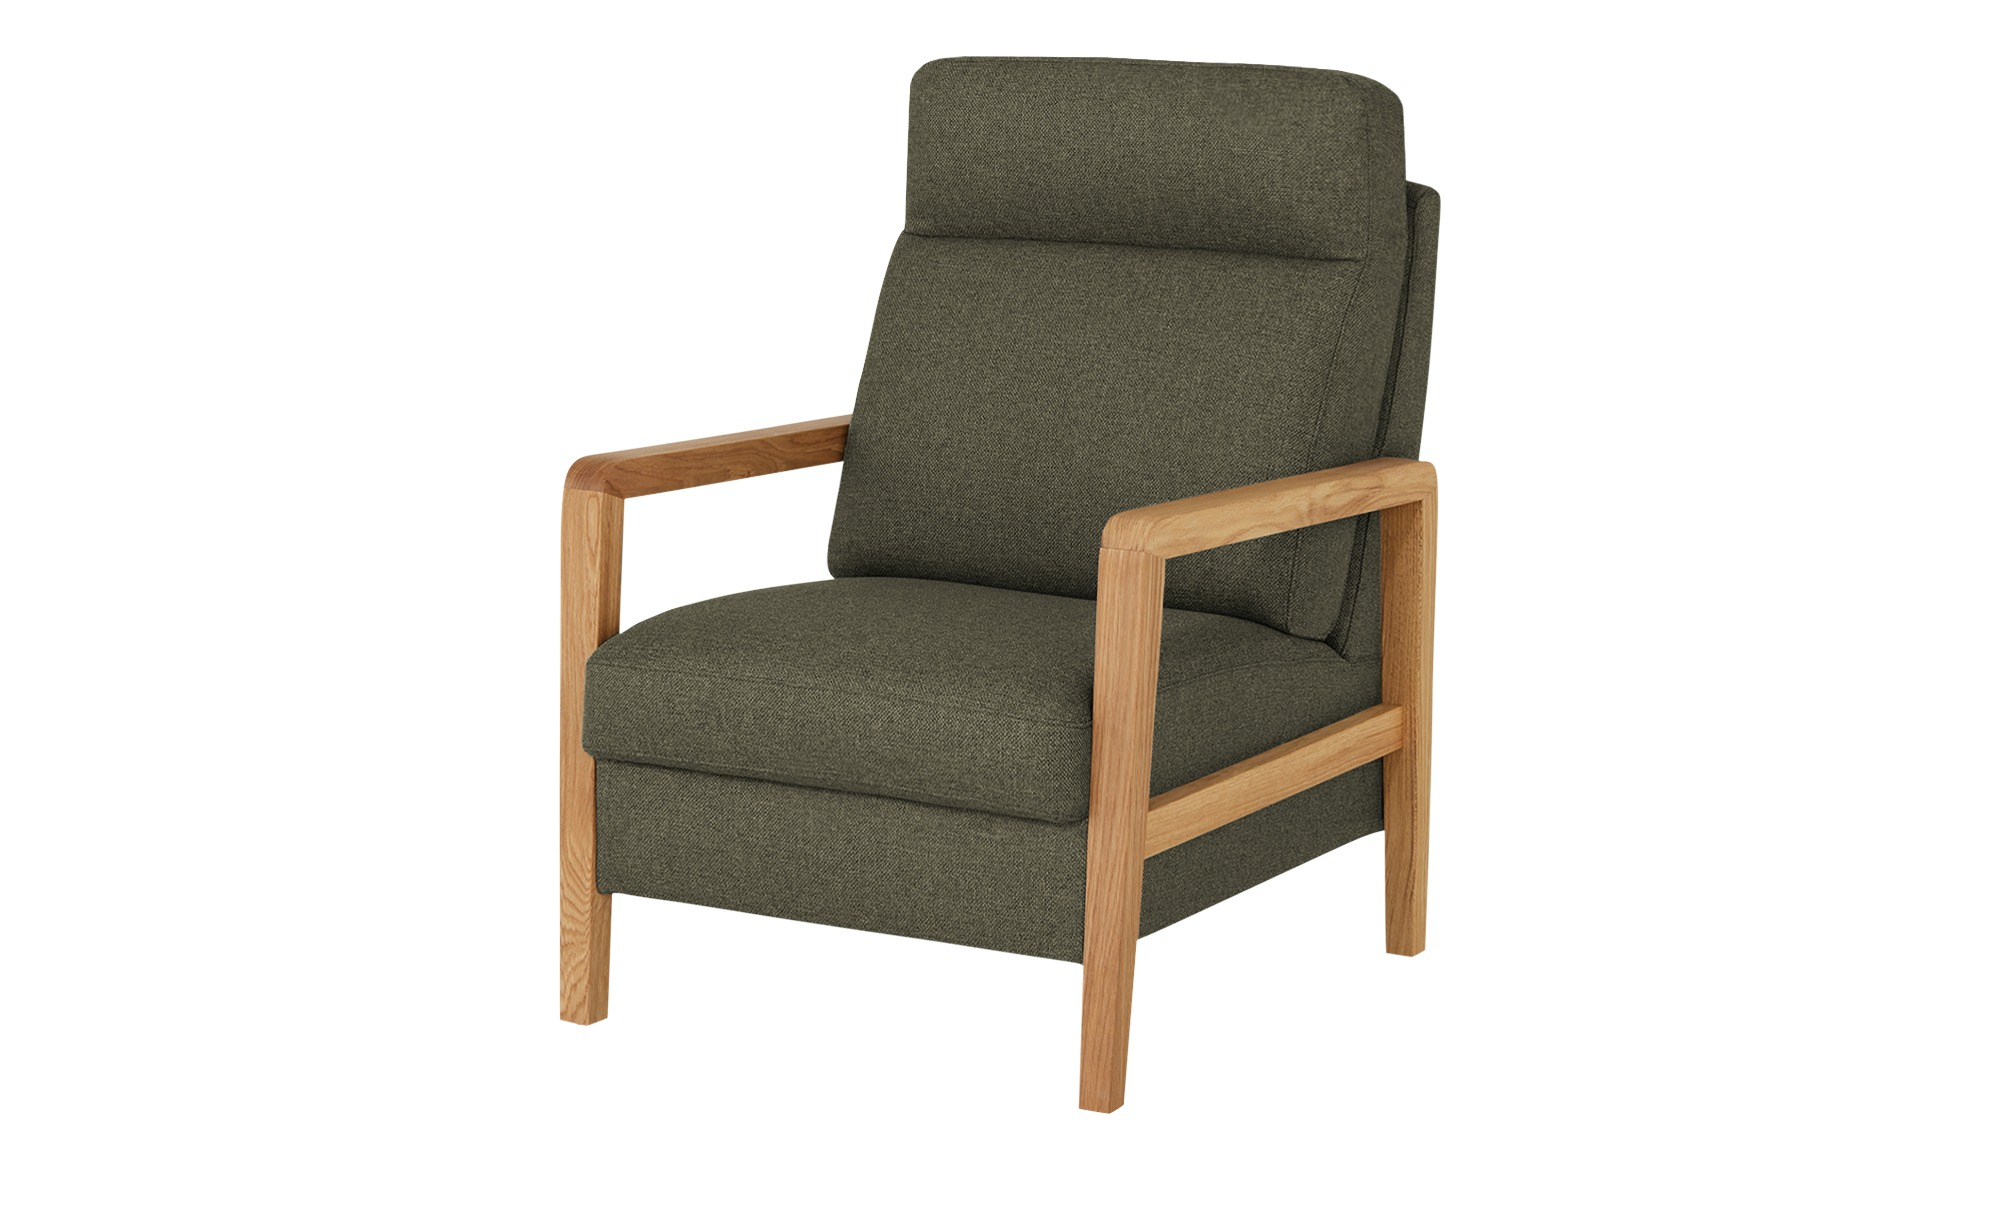 Wohnwert Sessel  Petra ¦ grün ¦ Maße (cm): B: 71 H: 103 T: 89 Polstermöbel > Sessel > Polstersessel - Höffner